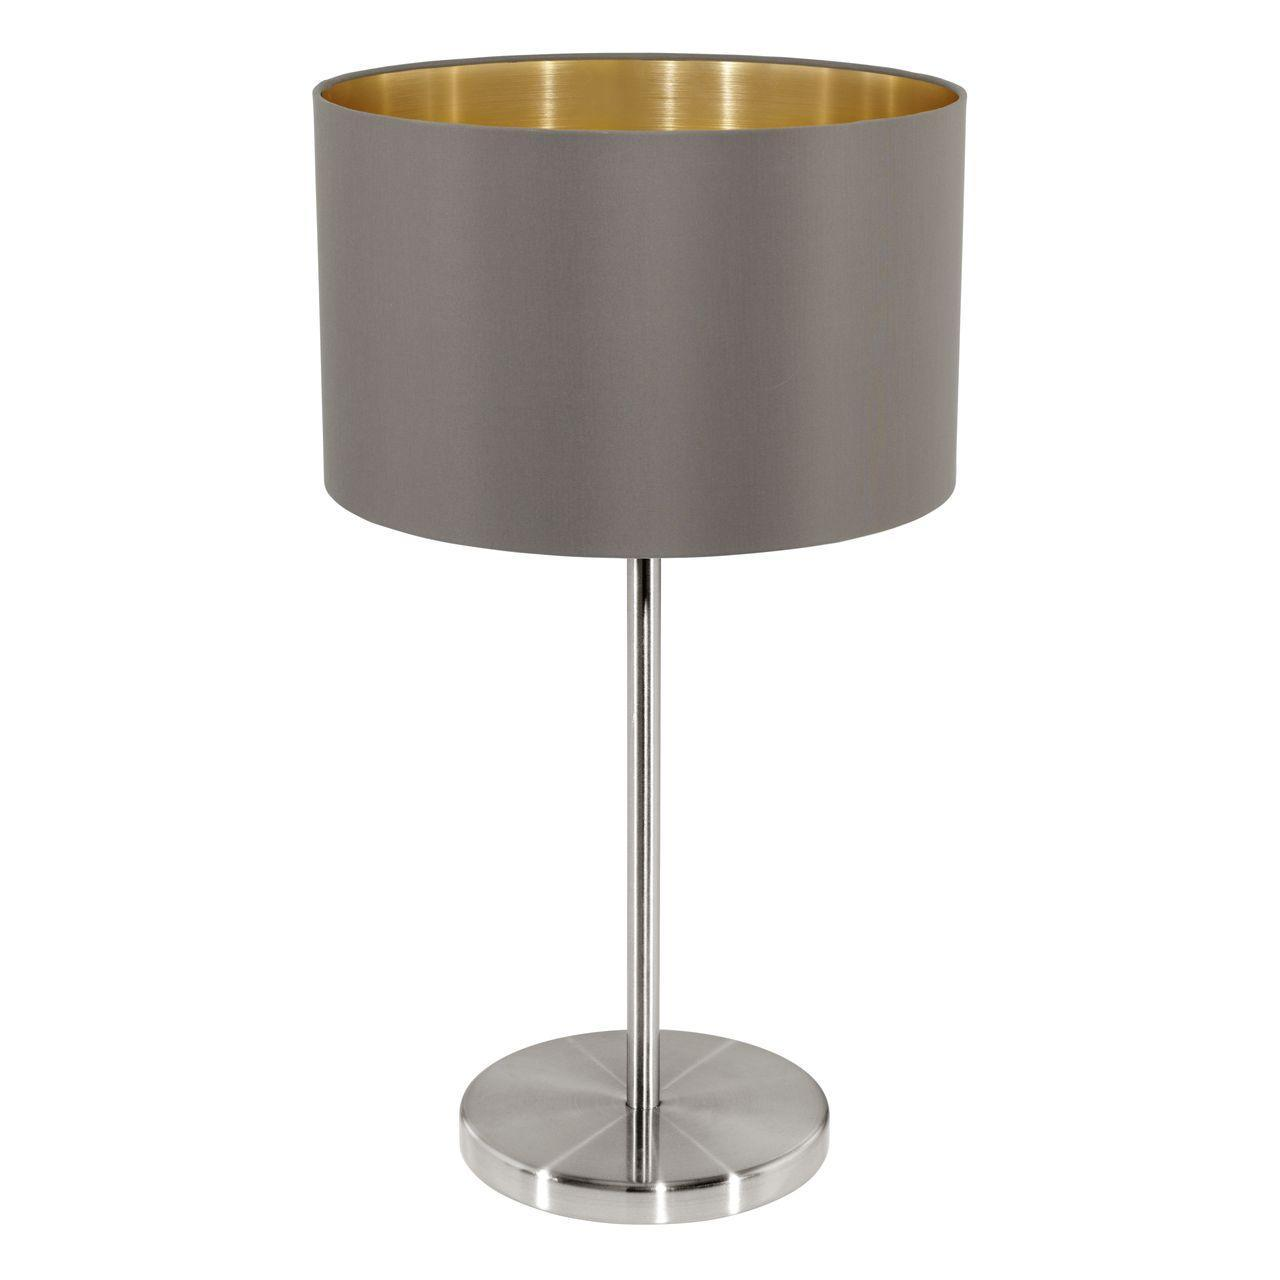 Настольная лампа Eglo Maserlo 31631 eglo настольная лампа декоративная maserlo